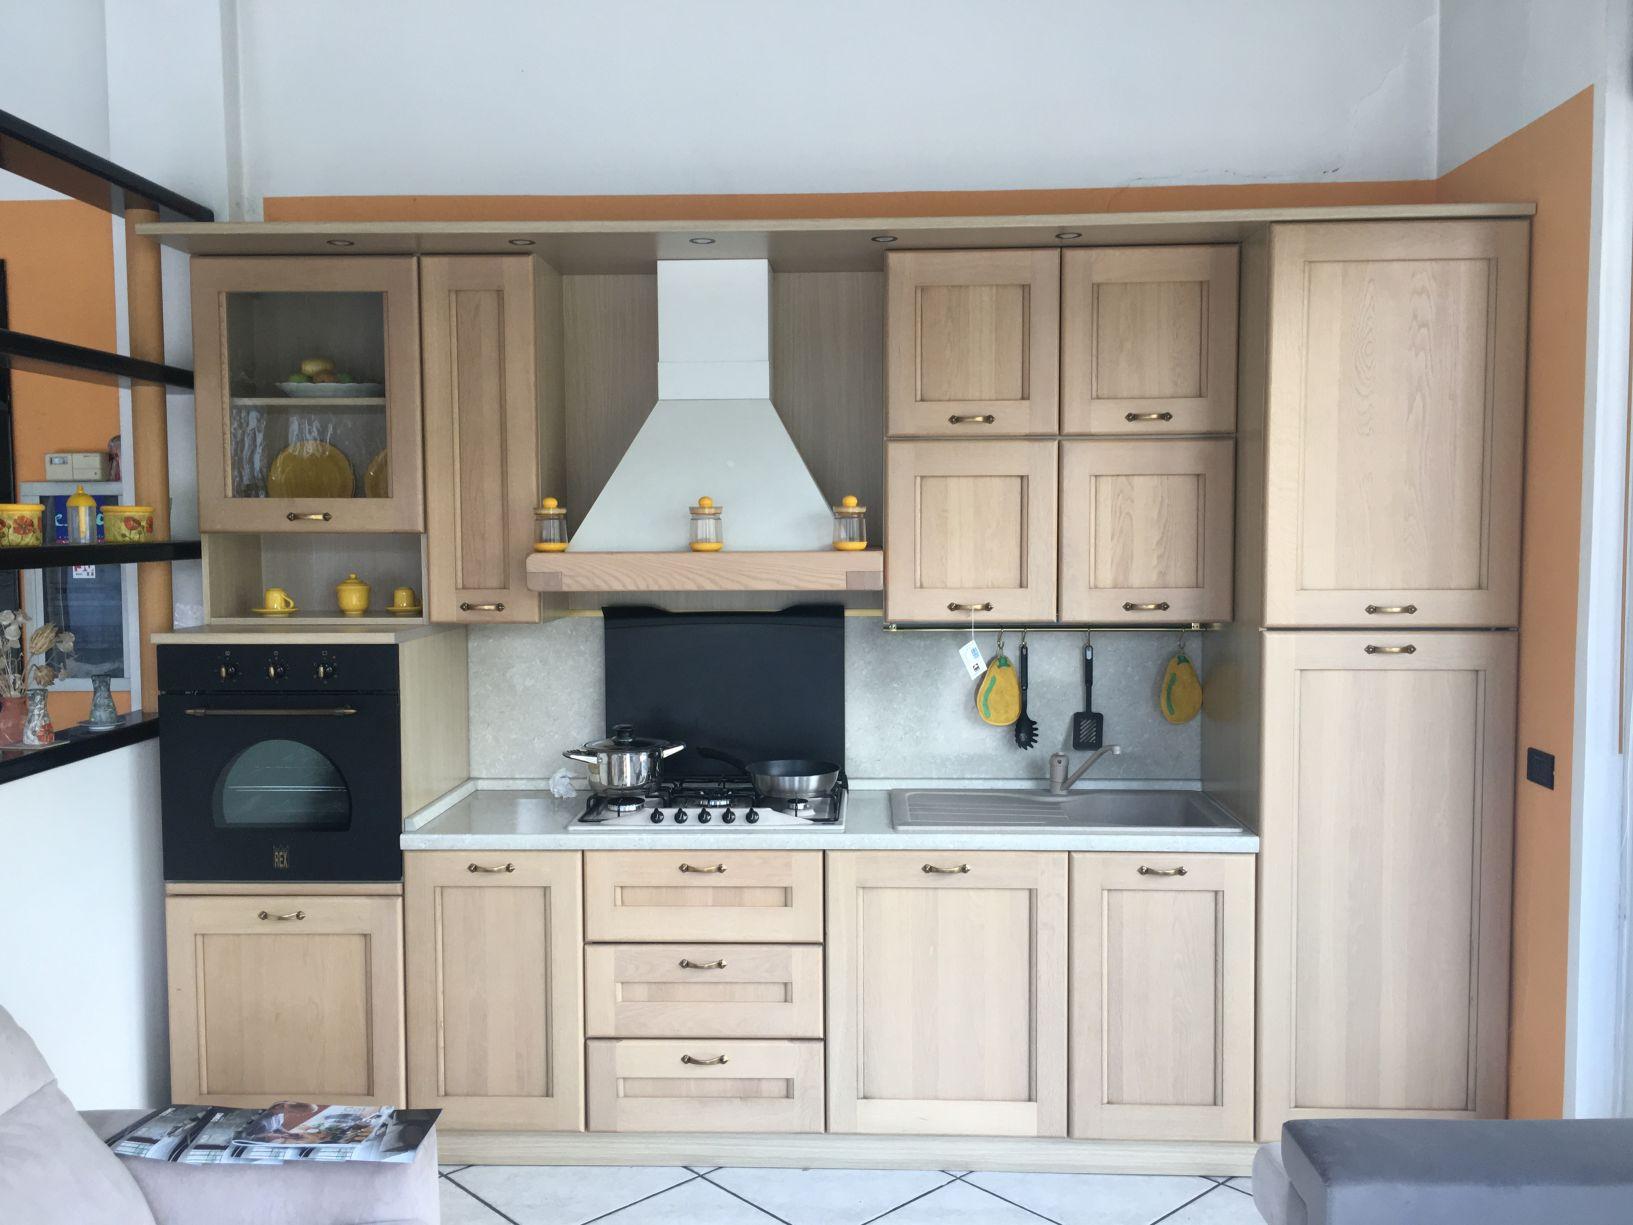 Cucina Componibile Rovere Sbiancato   Gallery Cucine Moderne Cucine Lube